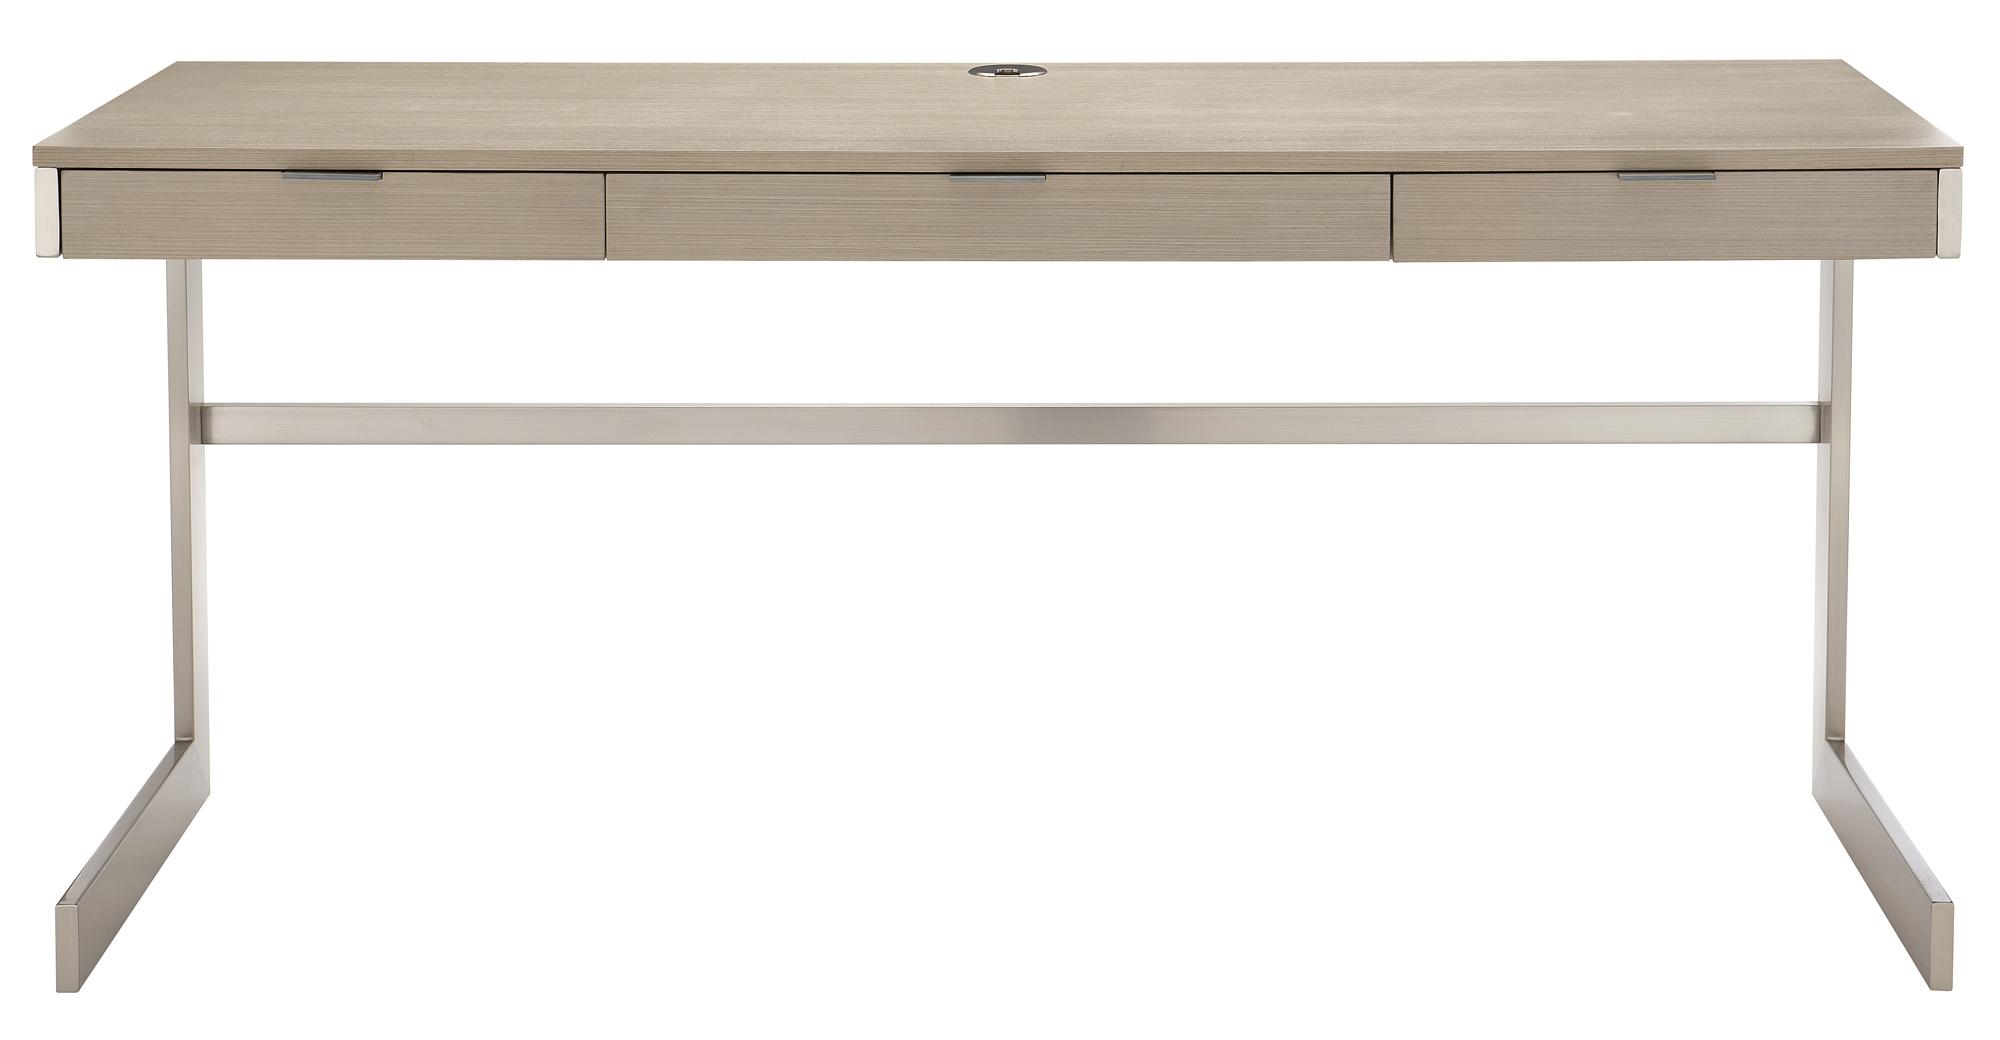 Paloma Desk by Bernhardt at Esprit Decor Home Furnishings